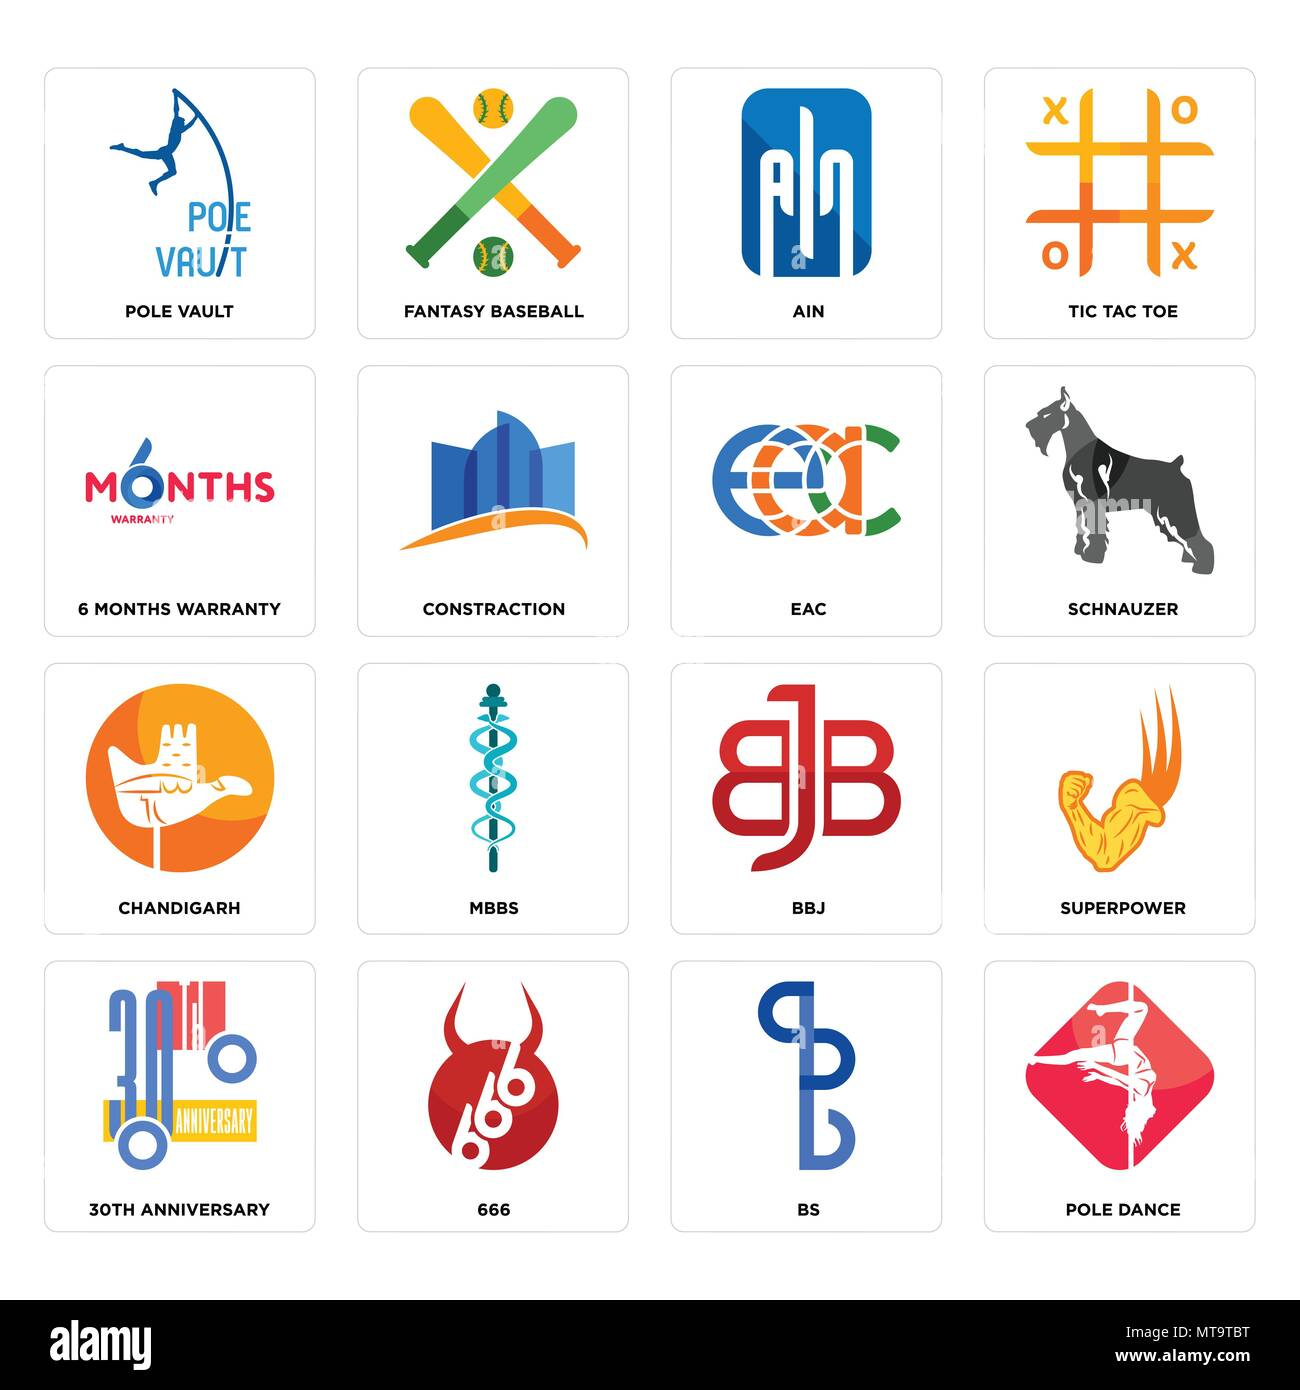 Bs Logo Stock Photos & Bs Logo Stock Images - Alamy